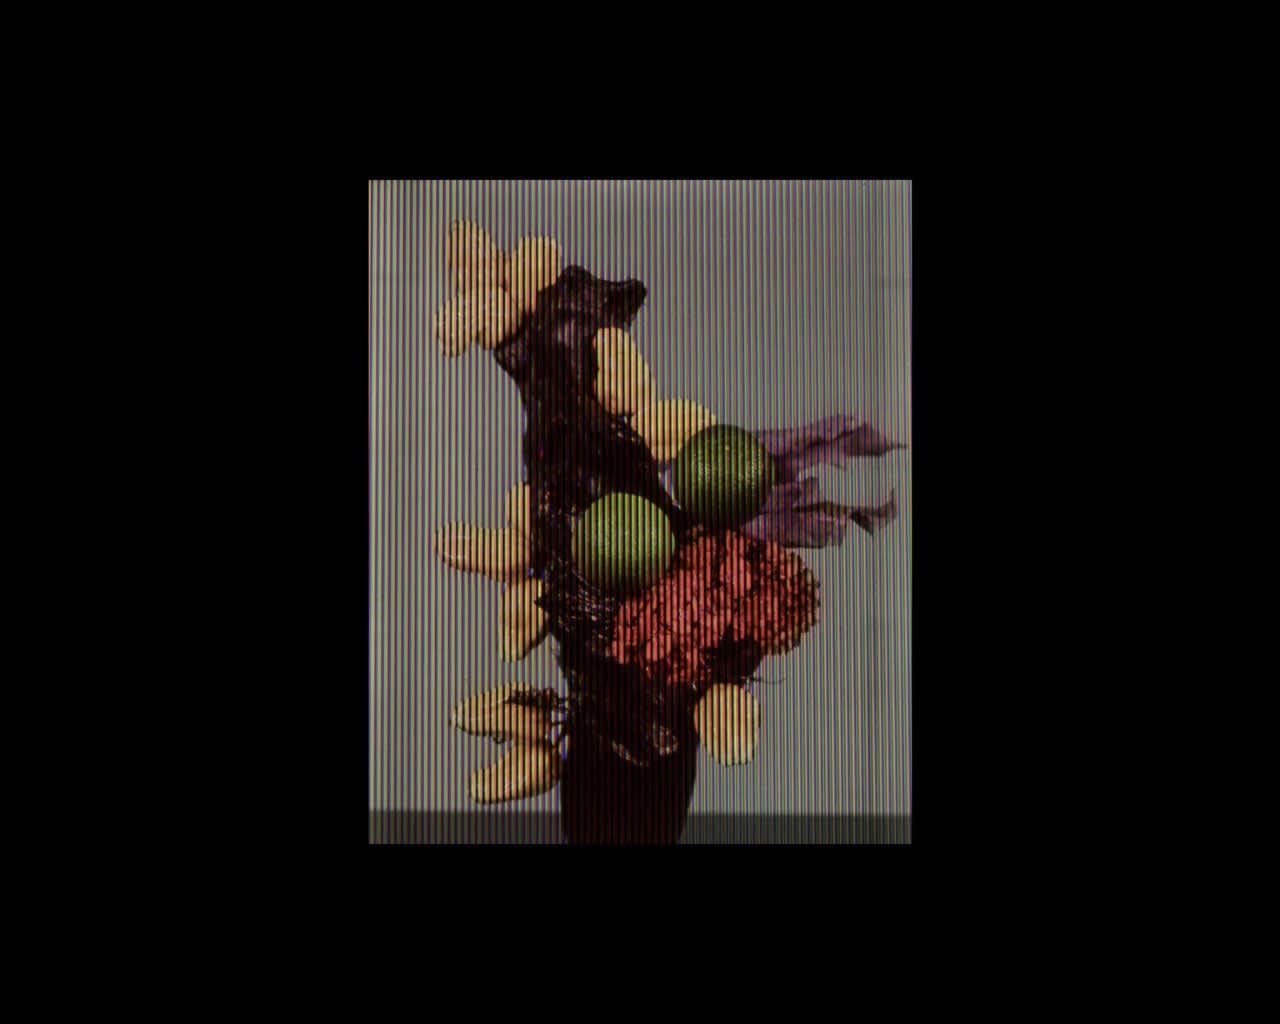 Joly Screen Photographs - Fleurs Tarabiscoté: Alan Phelan